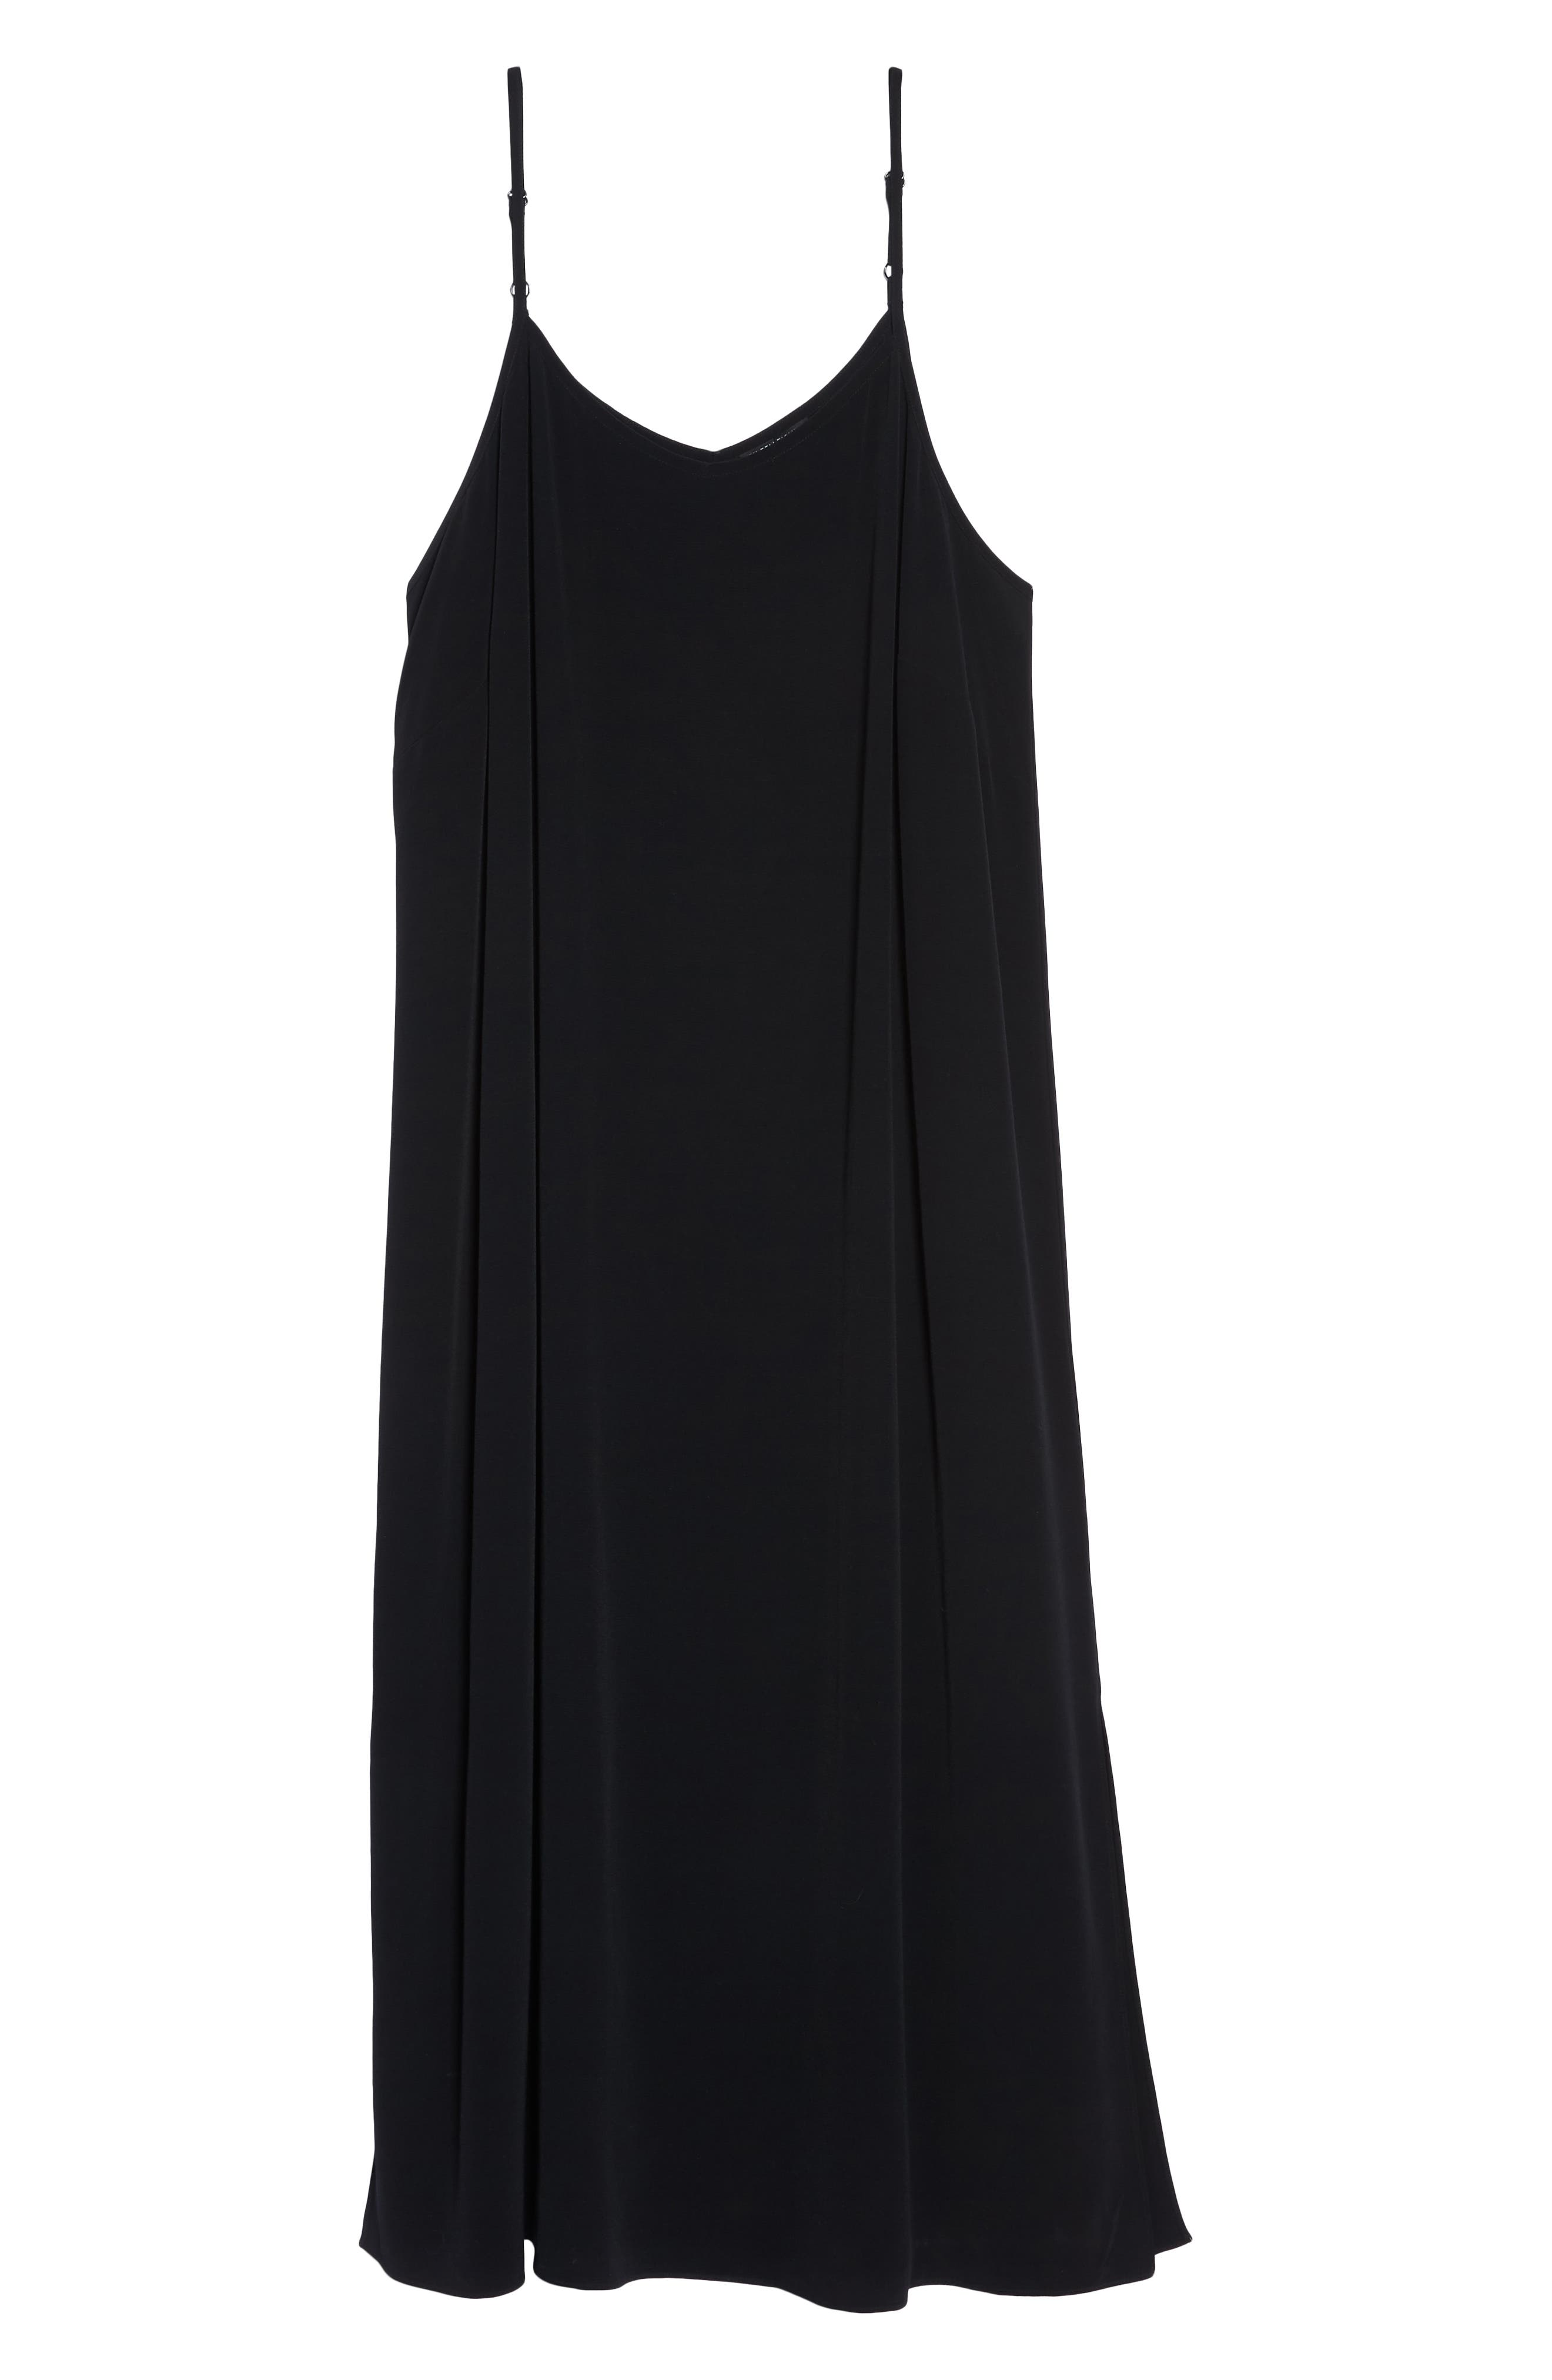 Cami Dress,                             Alternate thumbnail 7, color,                             001